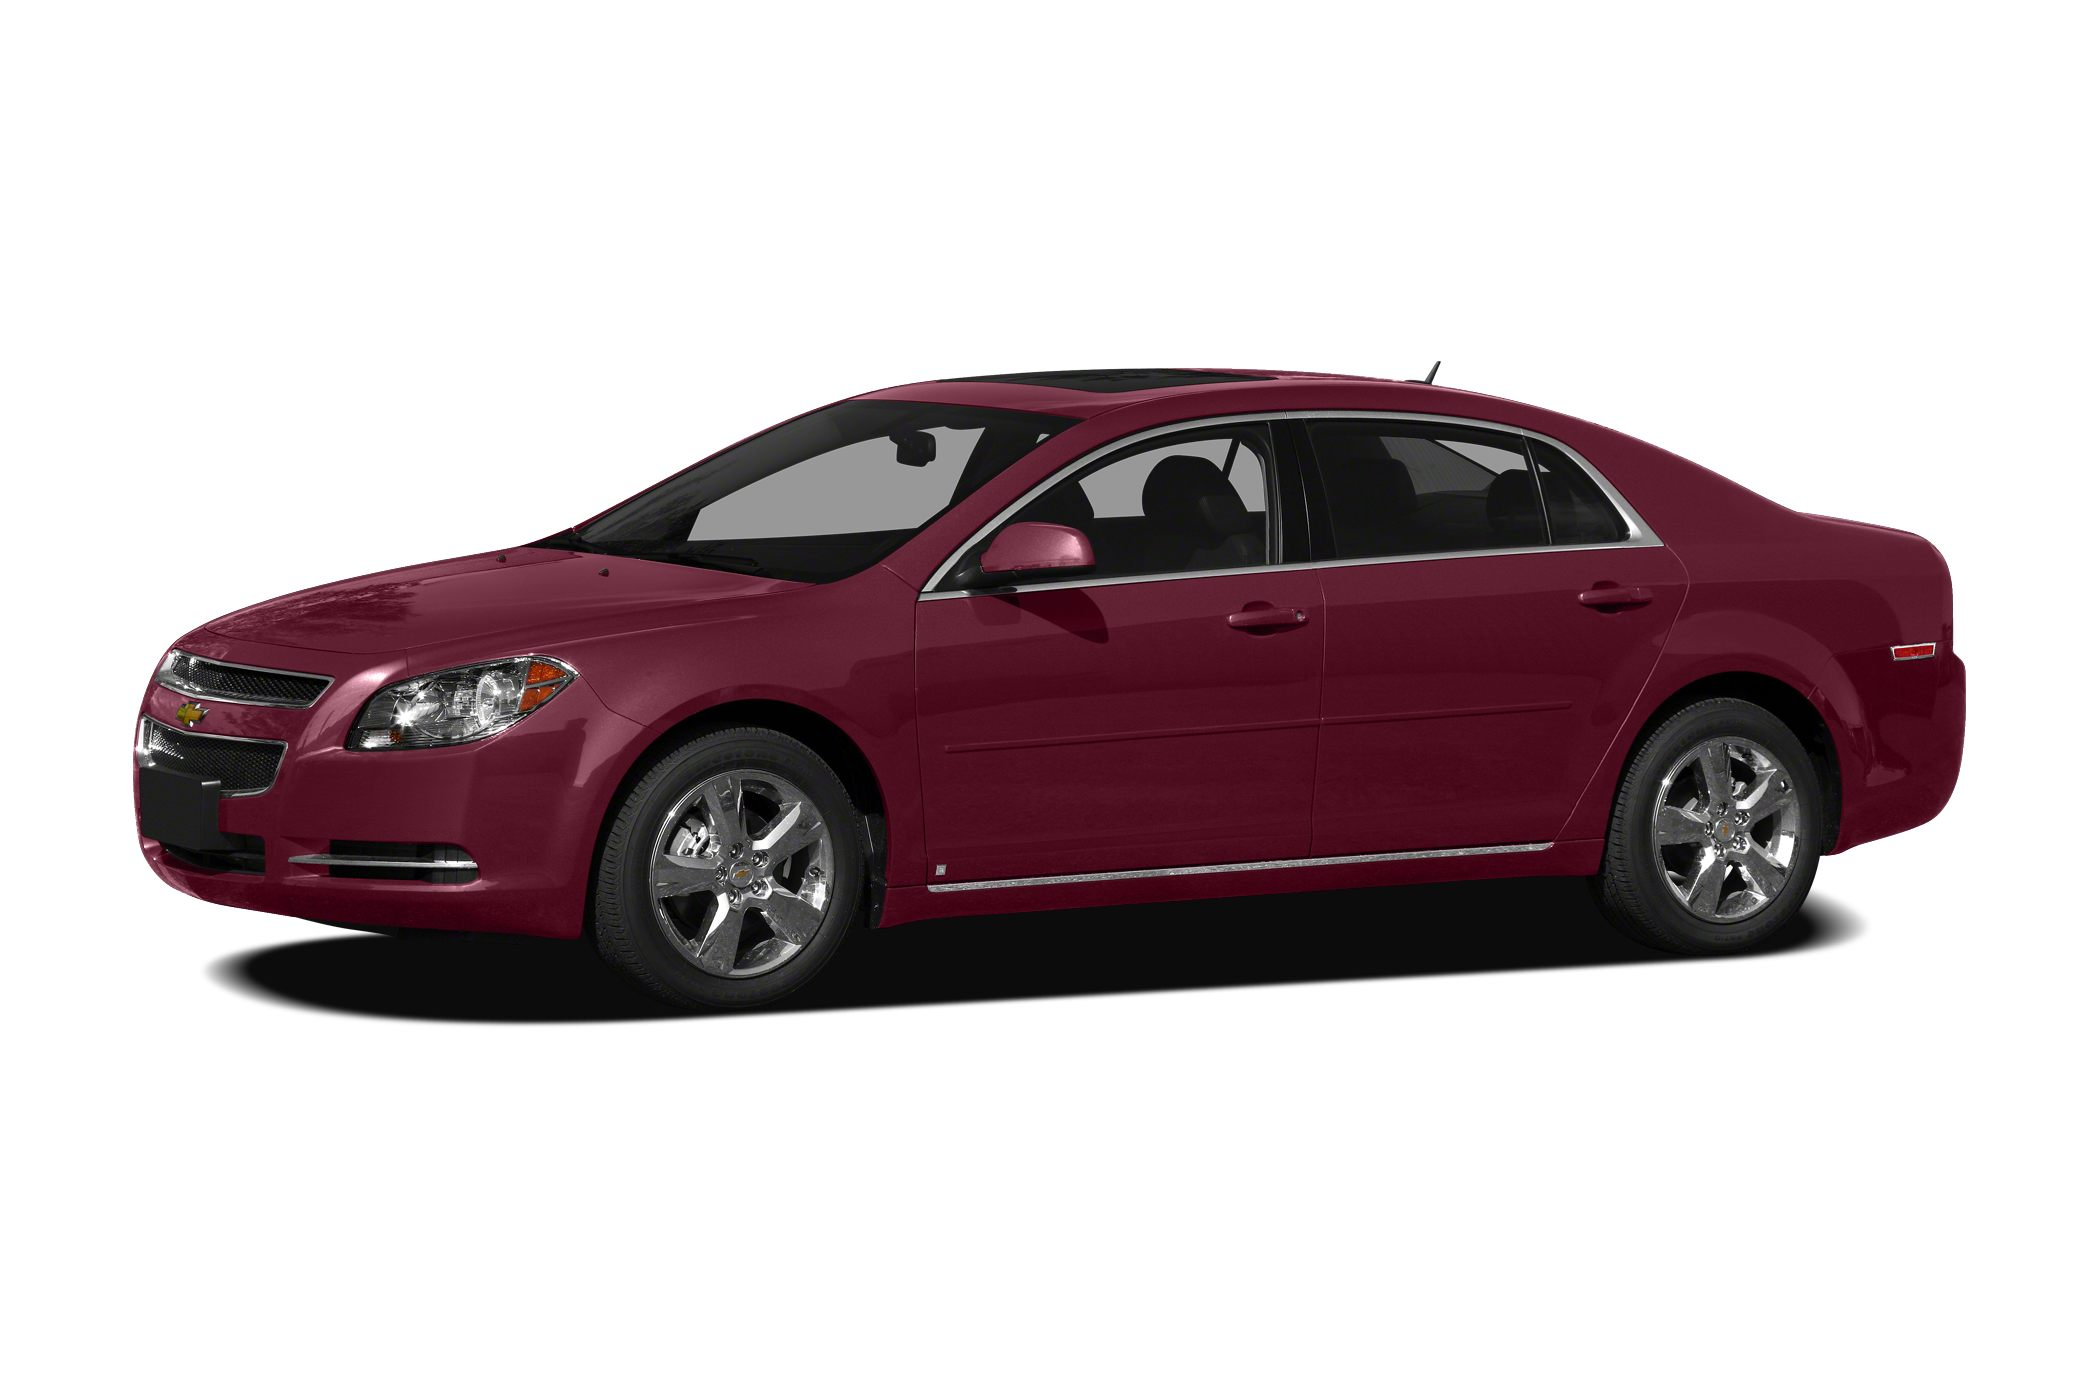 2011 Chevrolet Malibu Specs and Prices